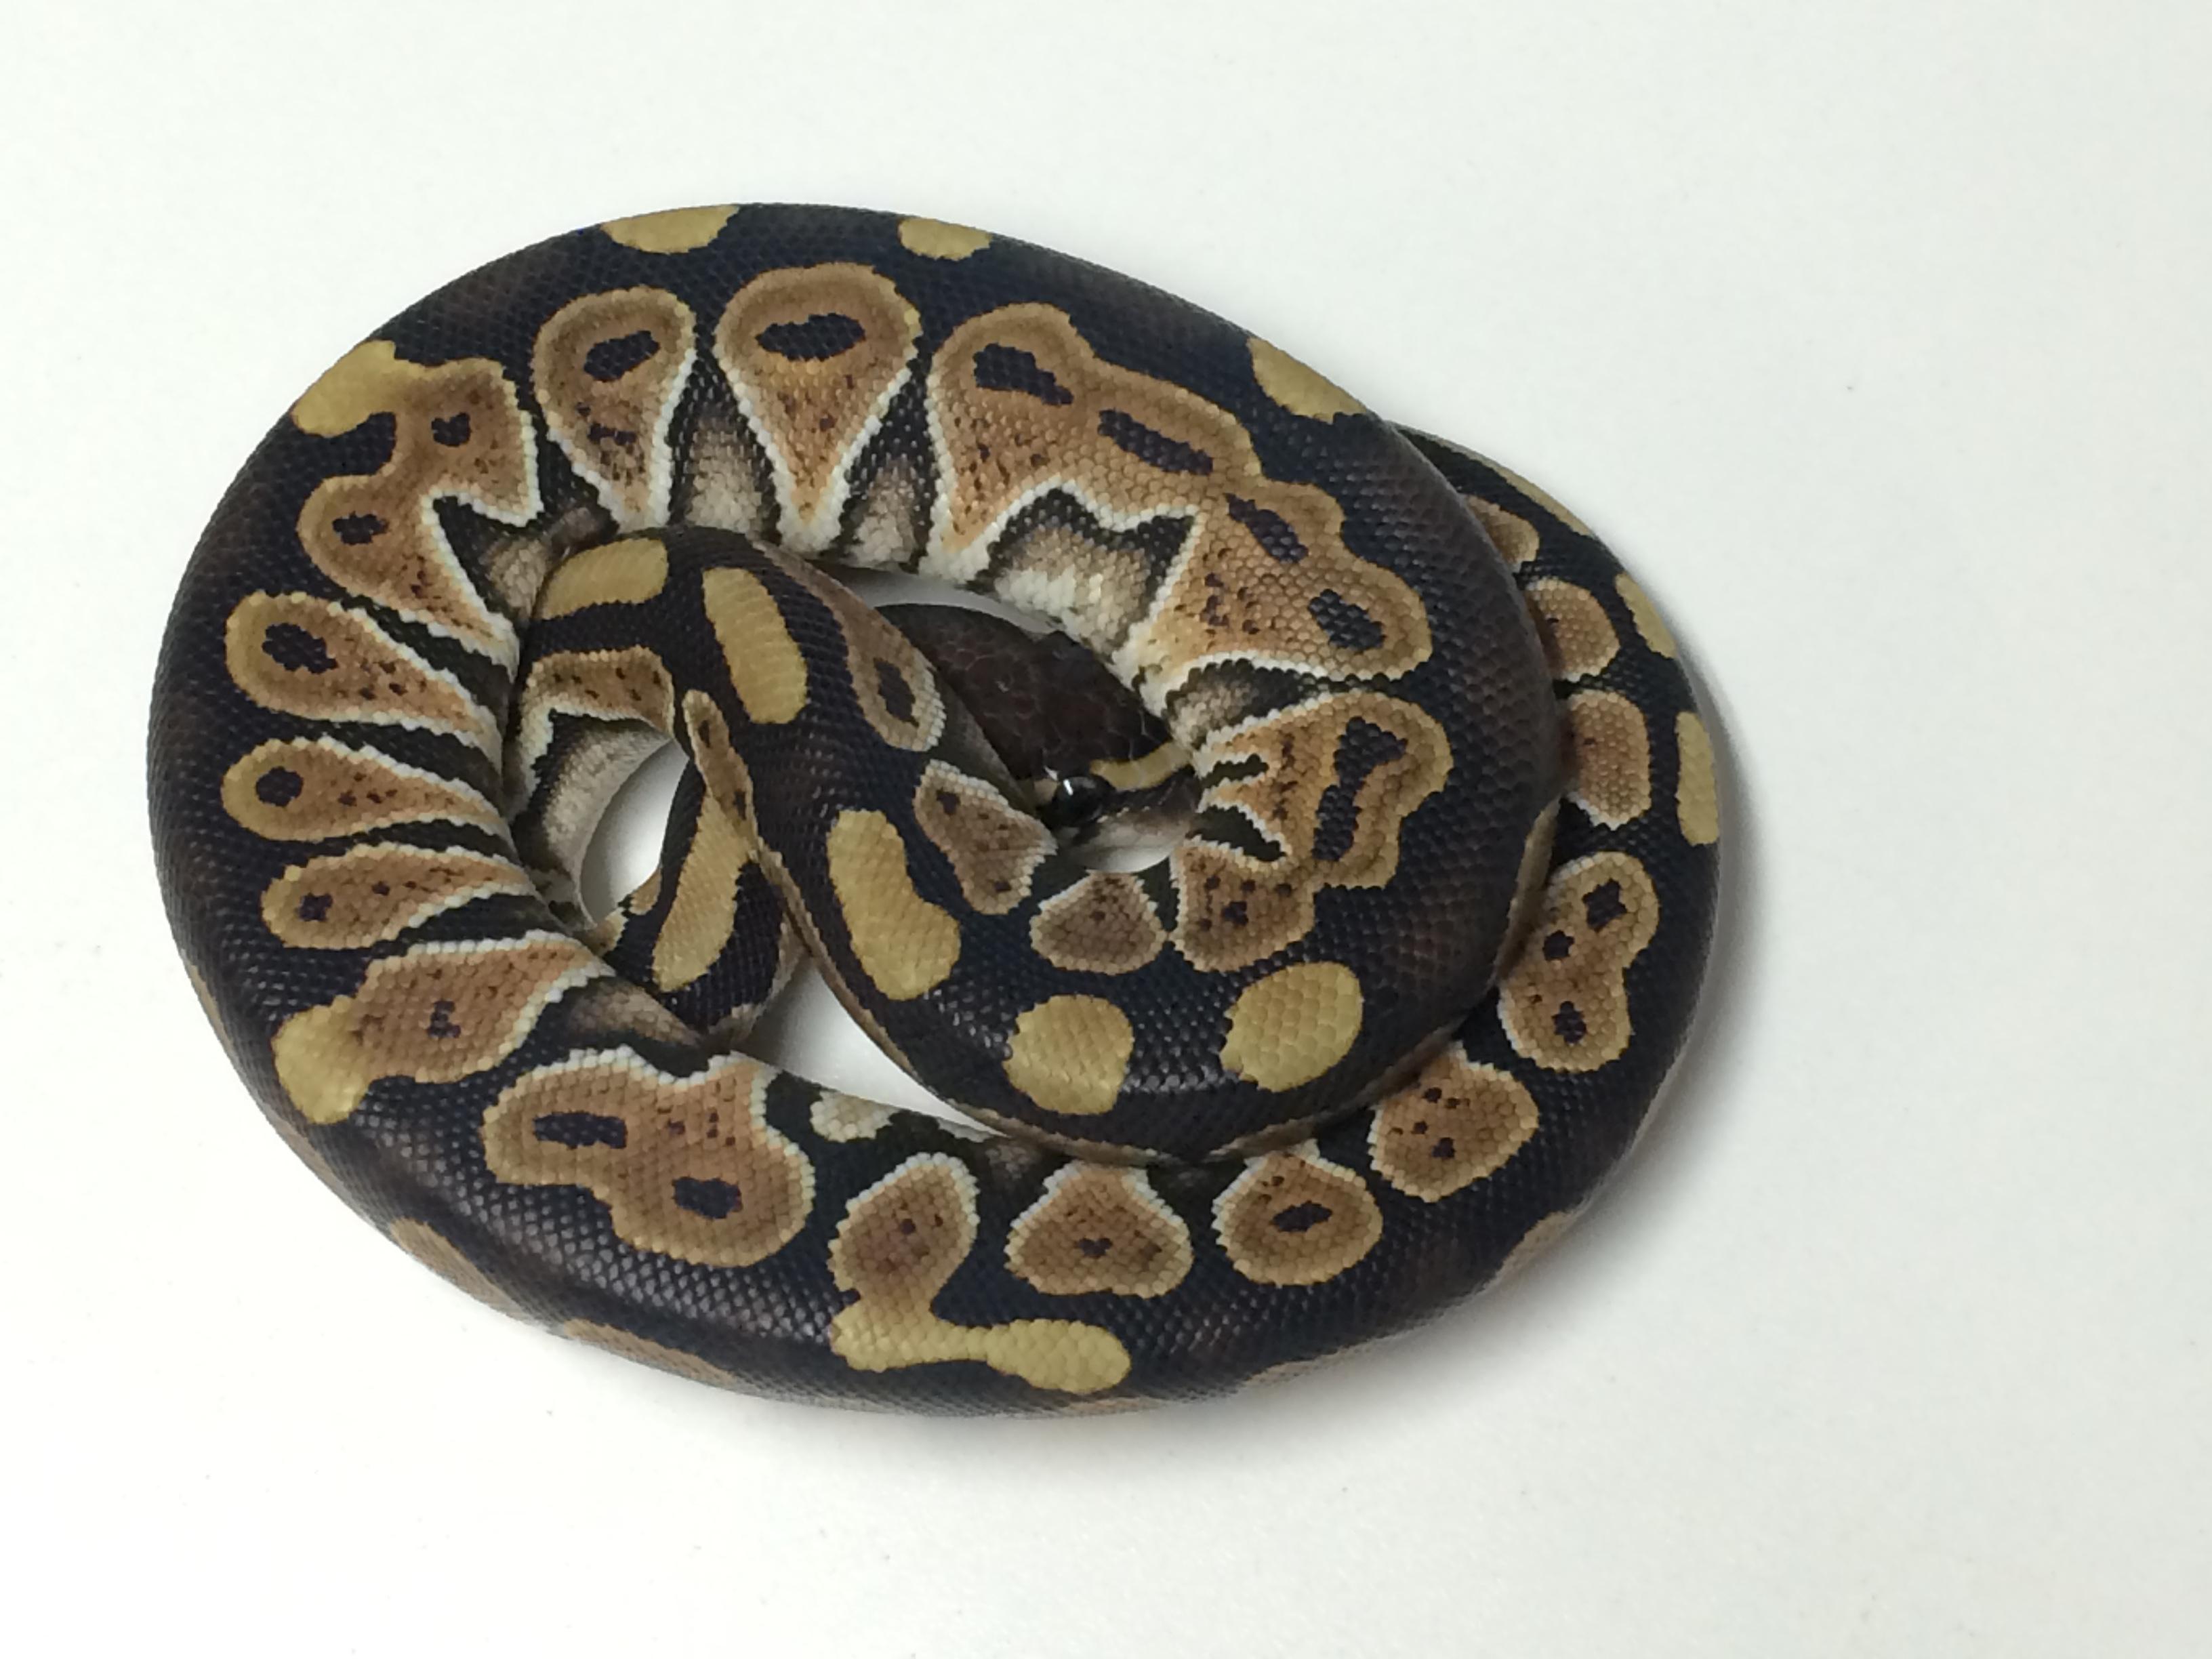 Baby Russo Ball Python